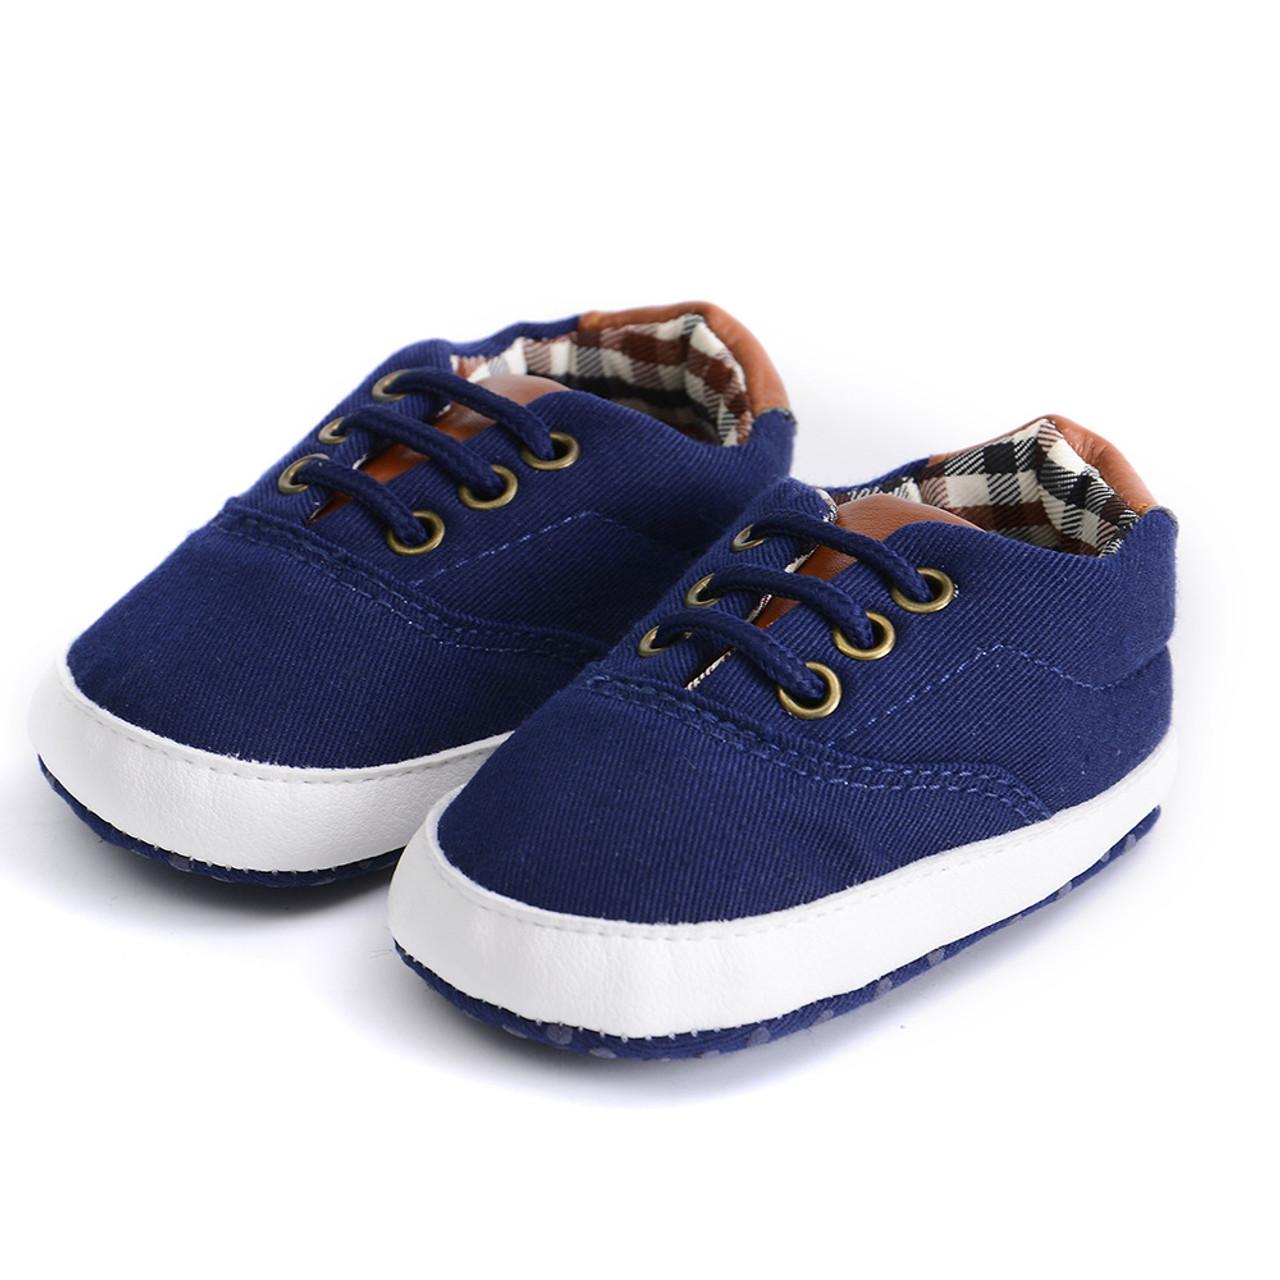 Newborn Baby Boys Kids Shoes Fashion